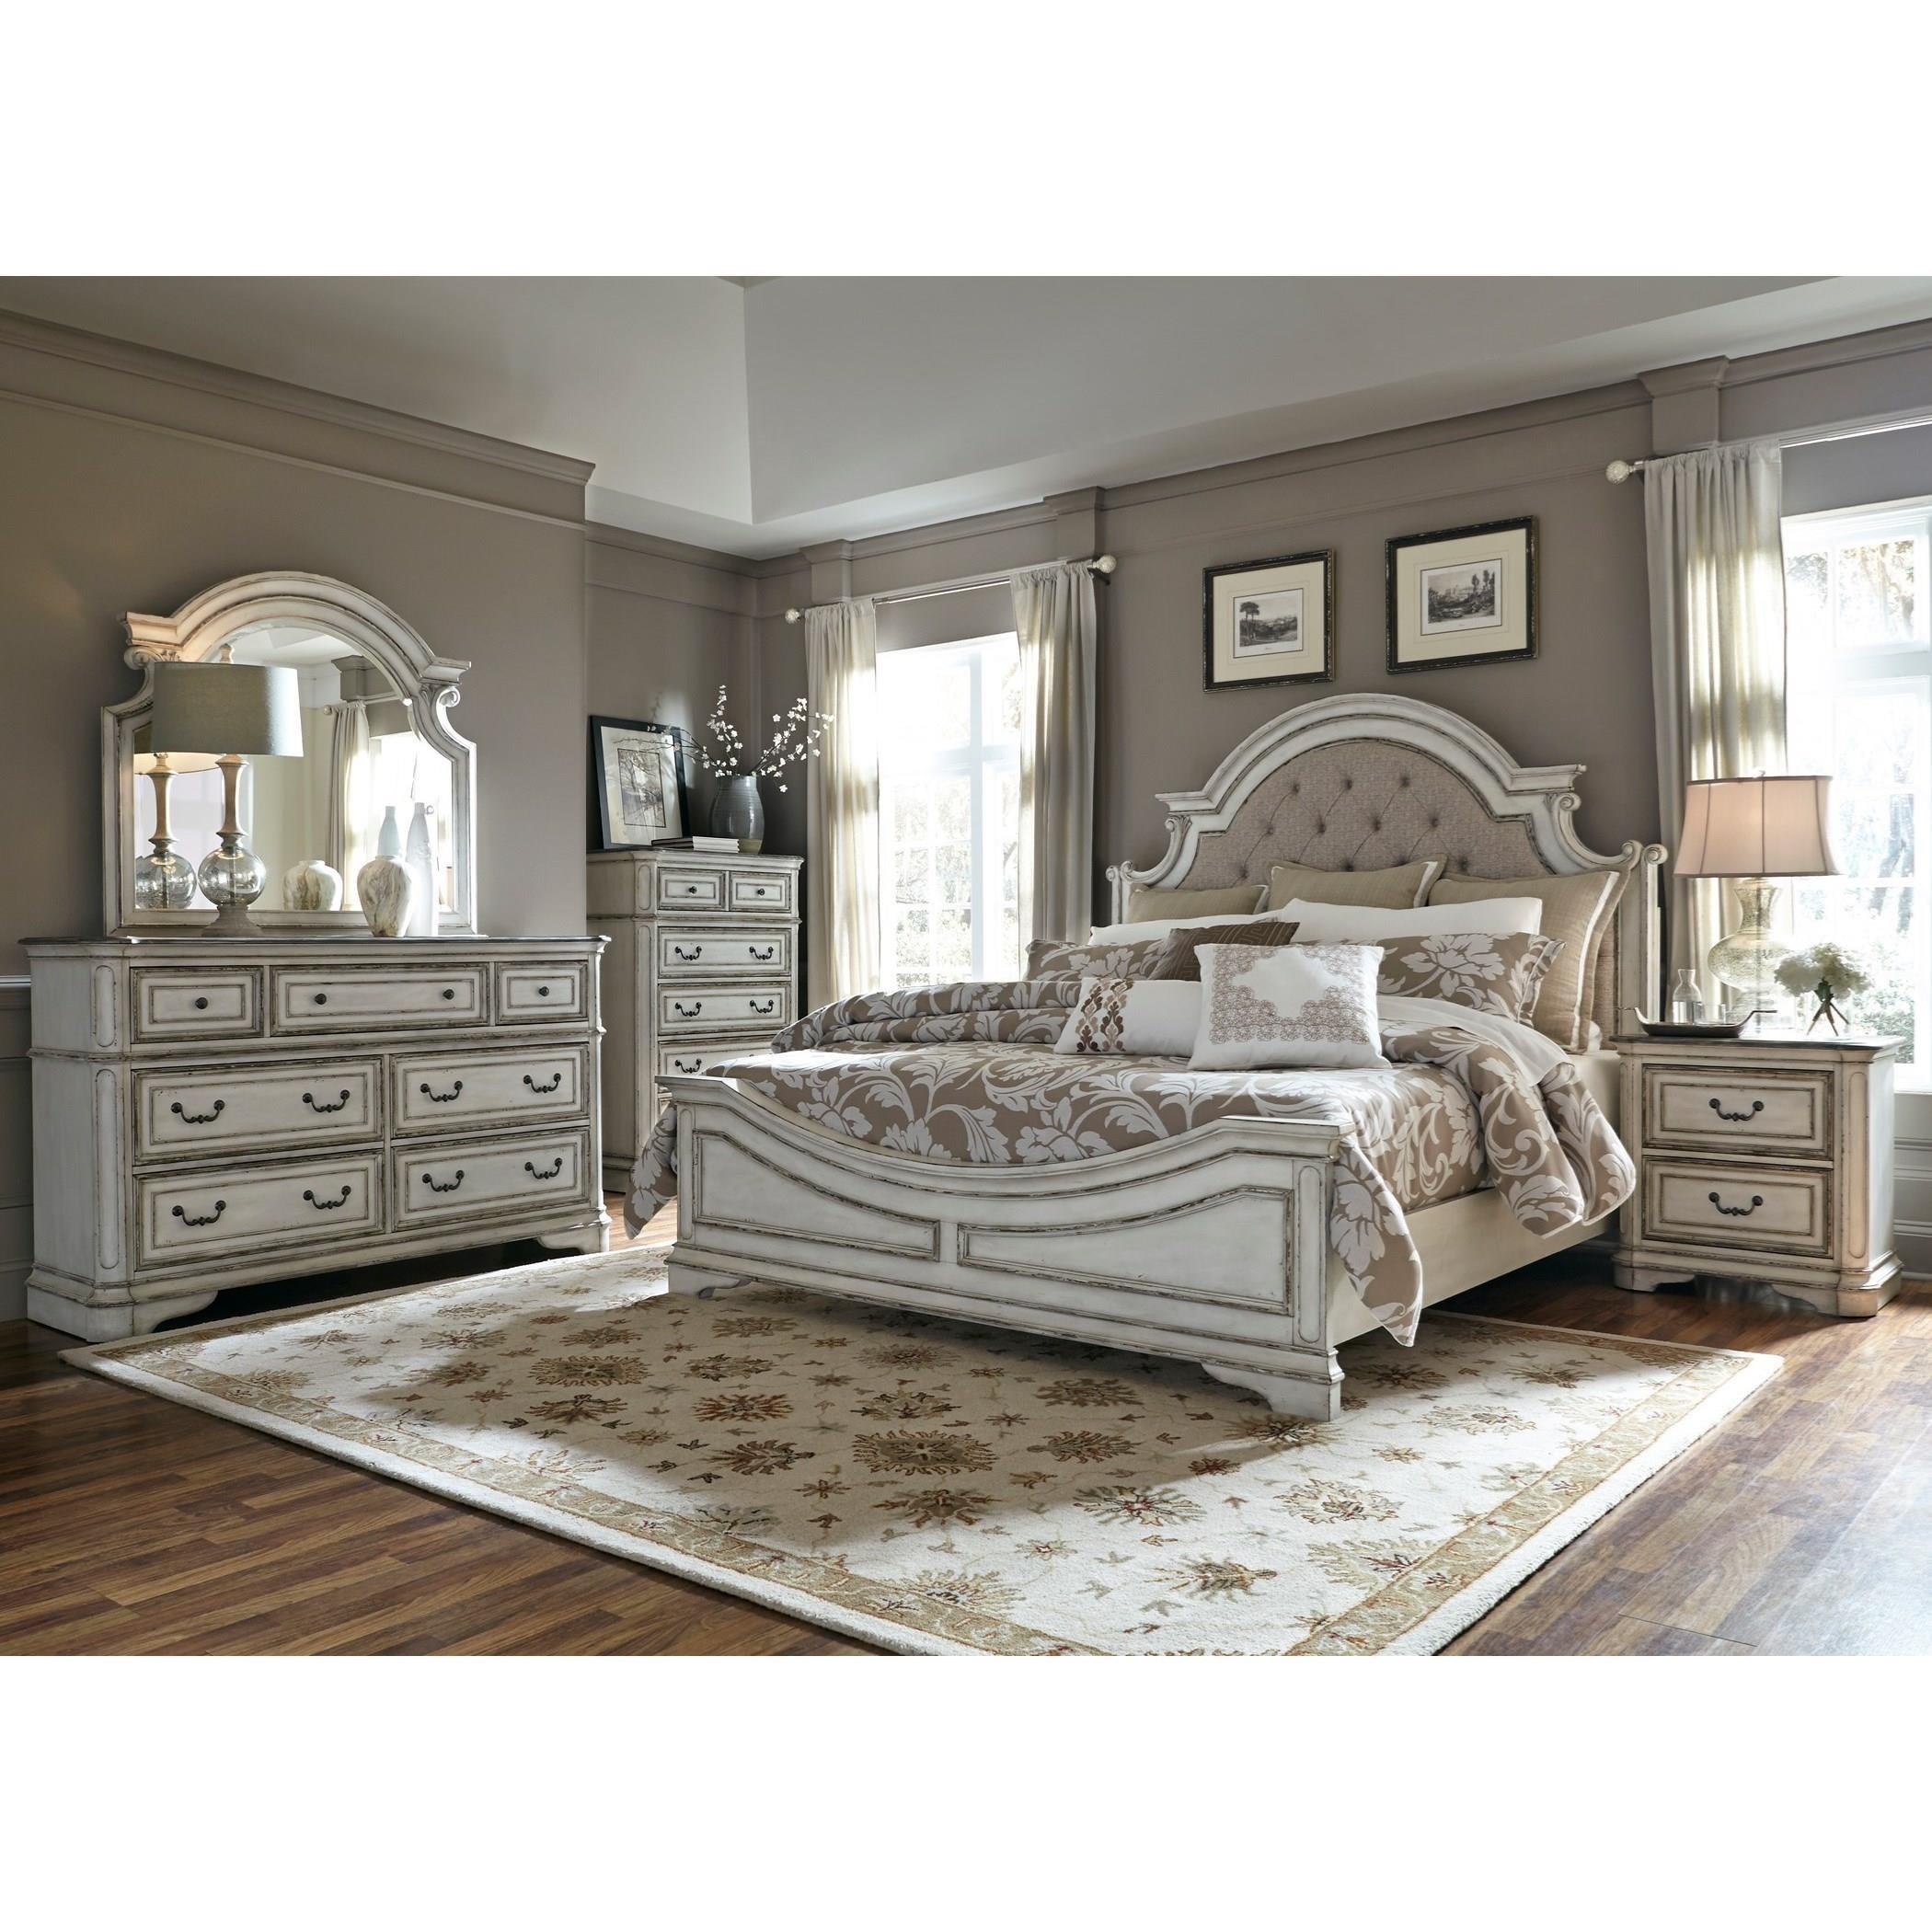 Memphis Furniture Company: Memphis Furniture Design